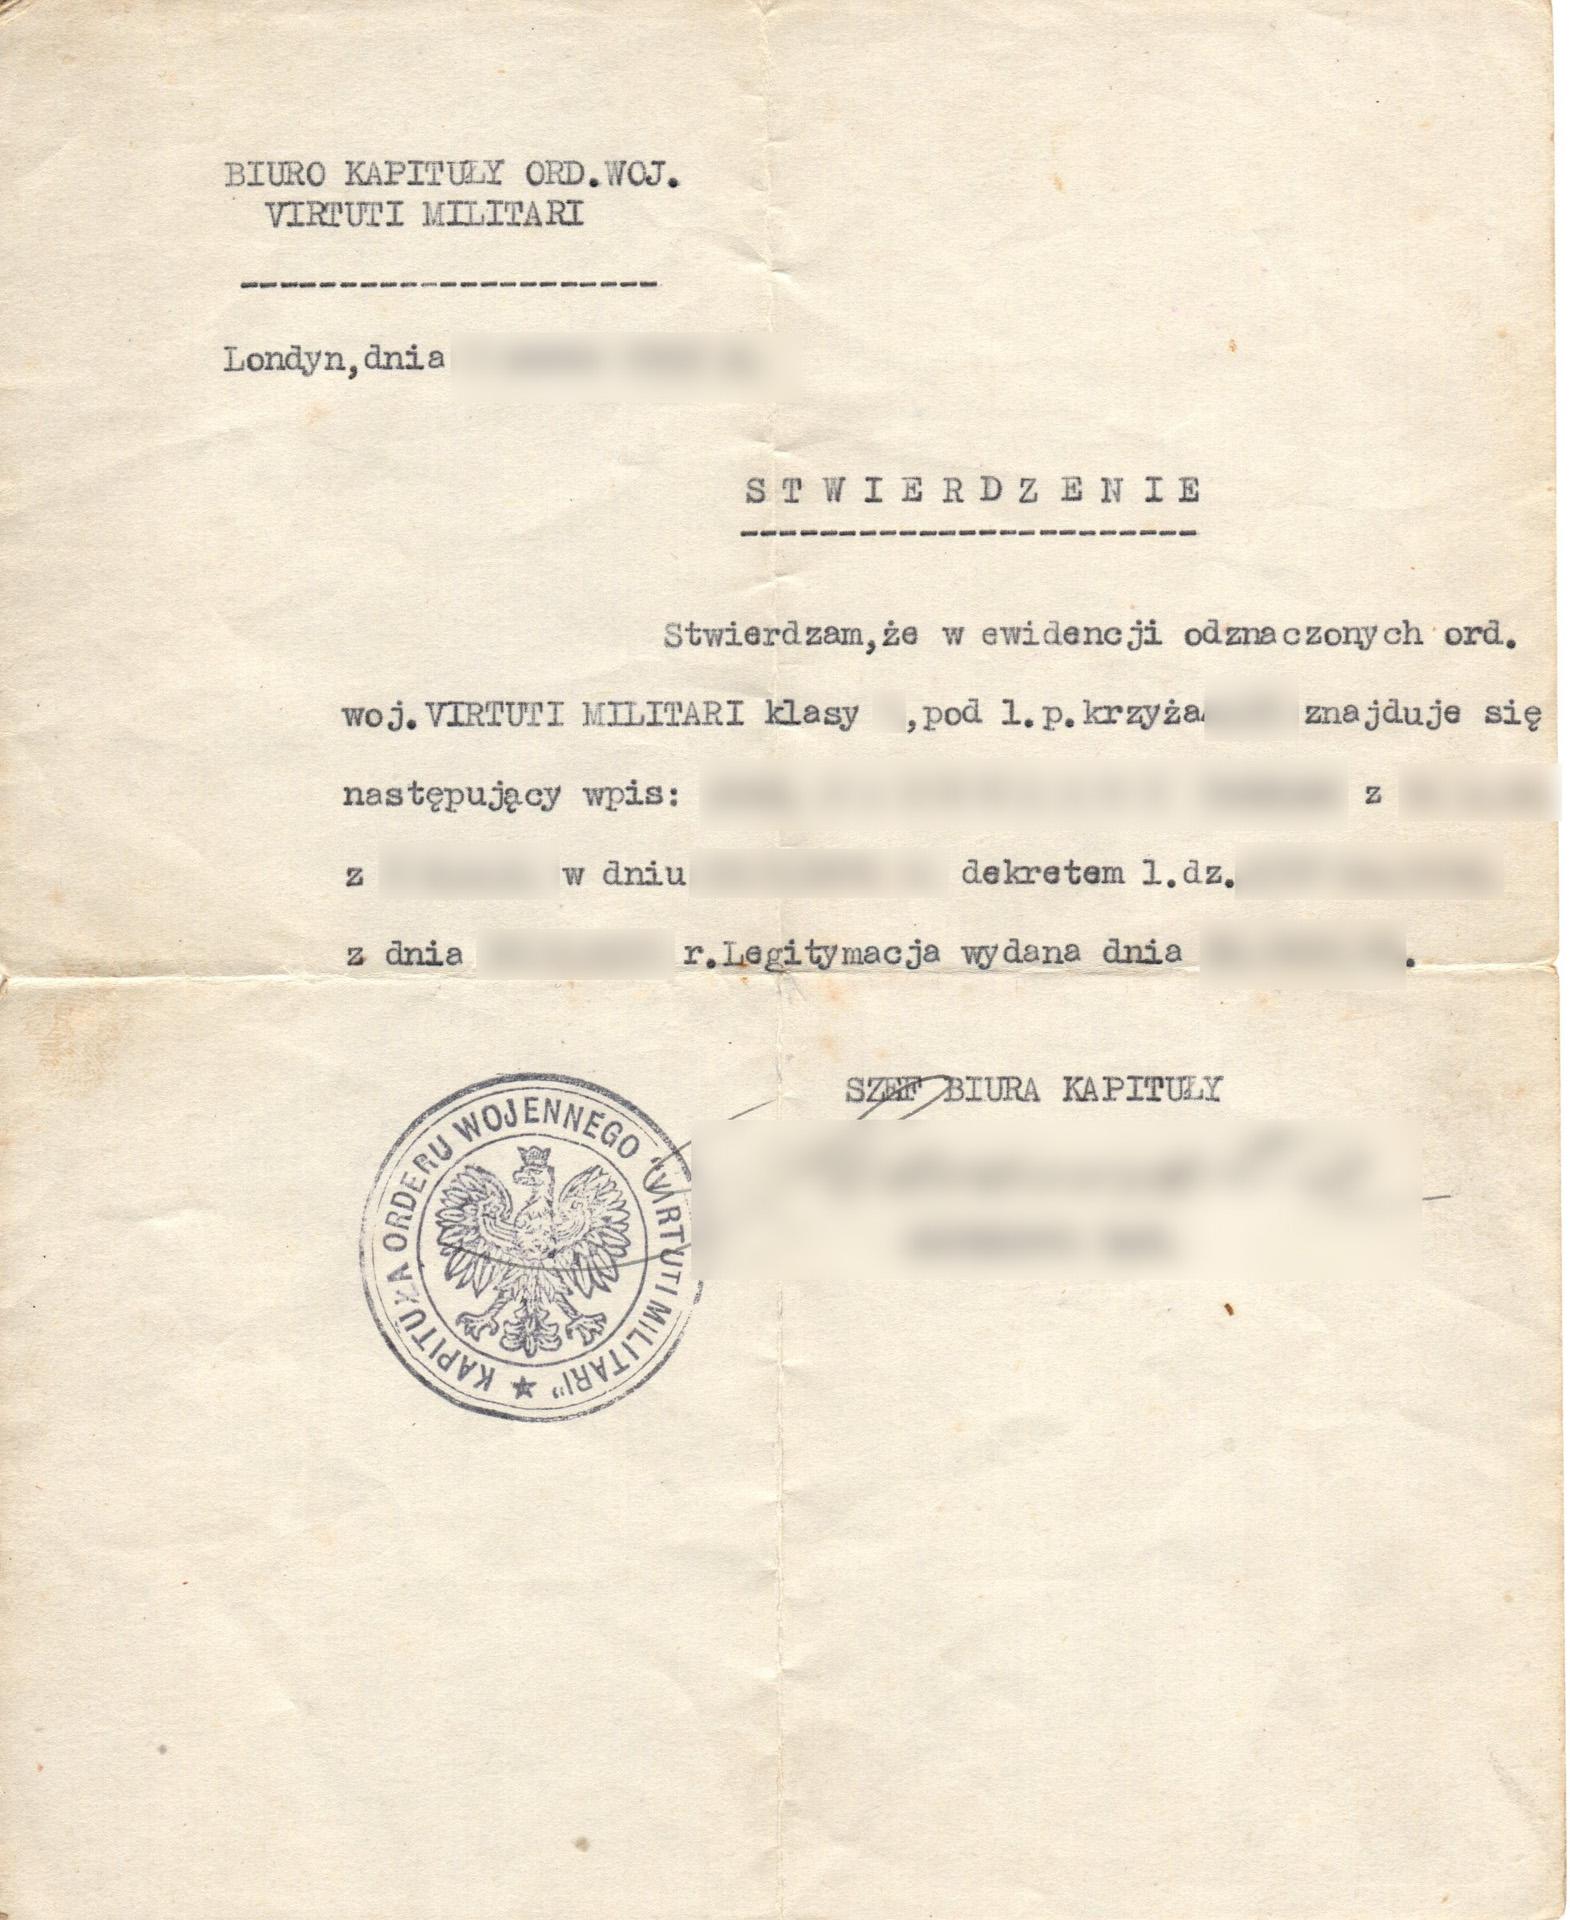 Certificate of receipt of Virtuti Militari / Zaświadczenie ws. otrzymania Virtuti Militari